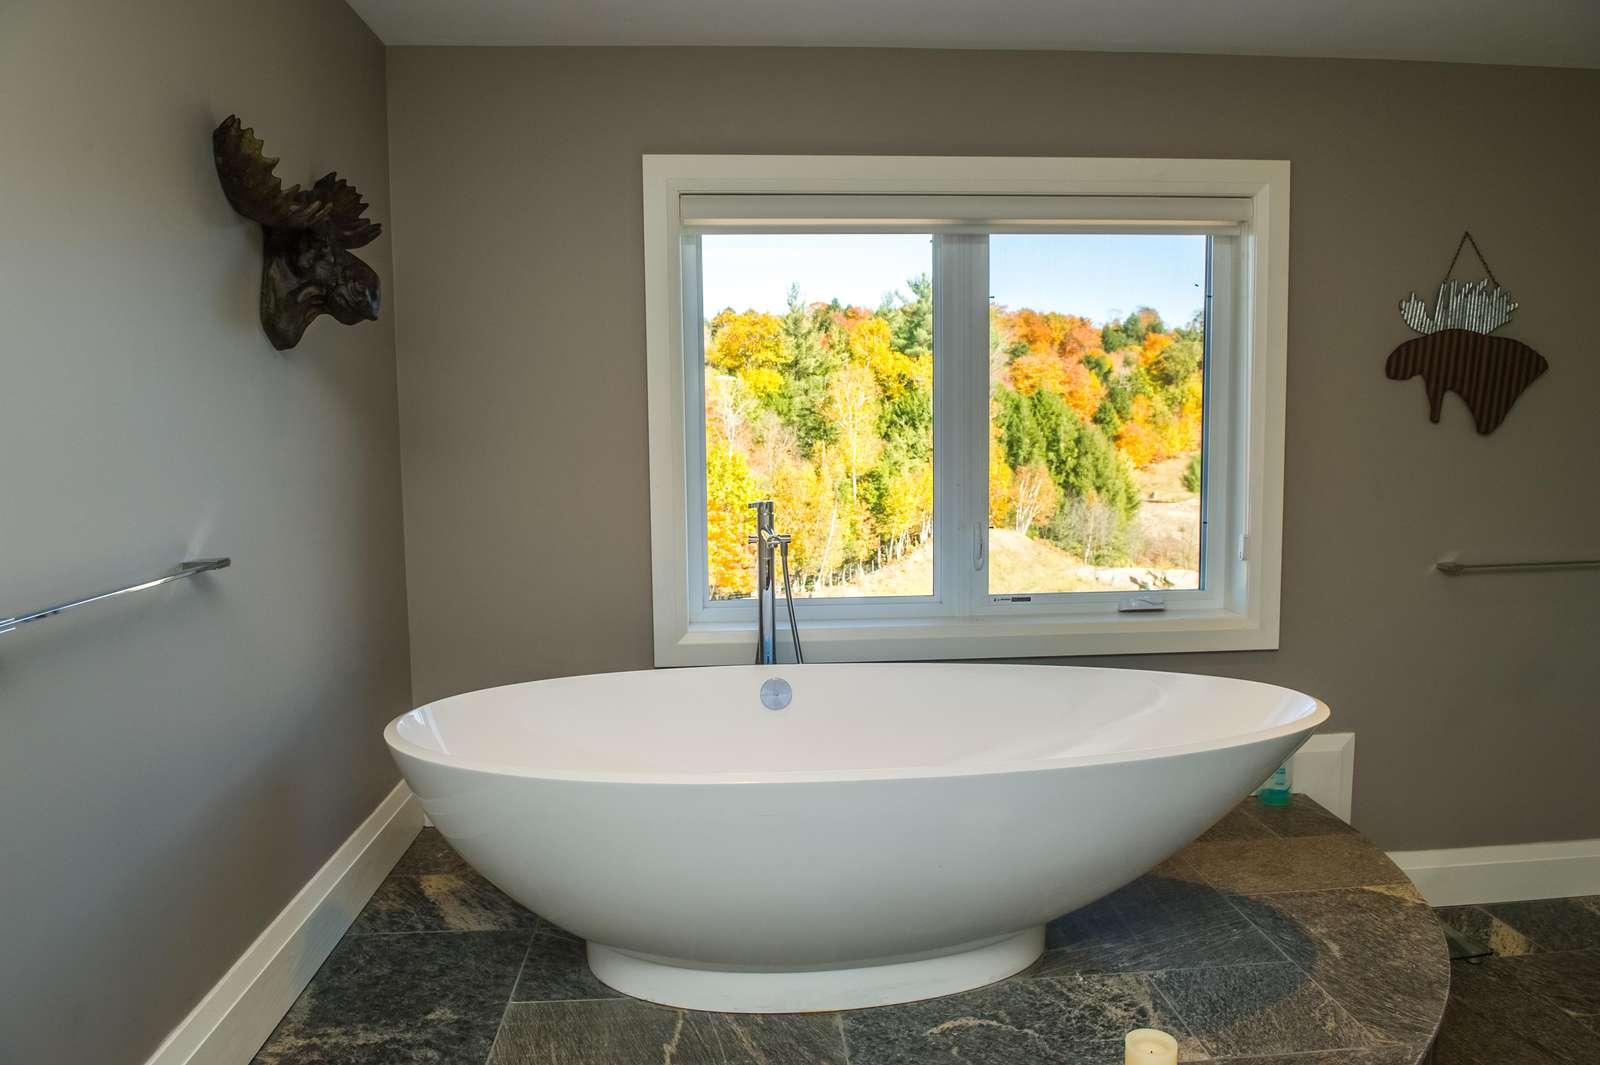 Master soaker tub with views